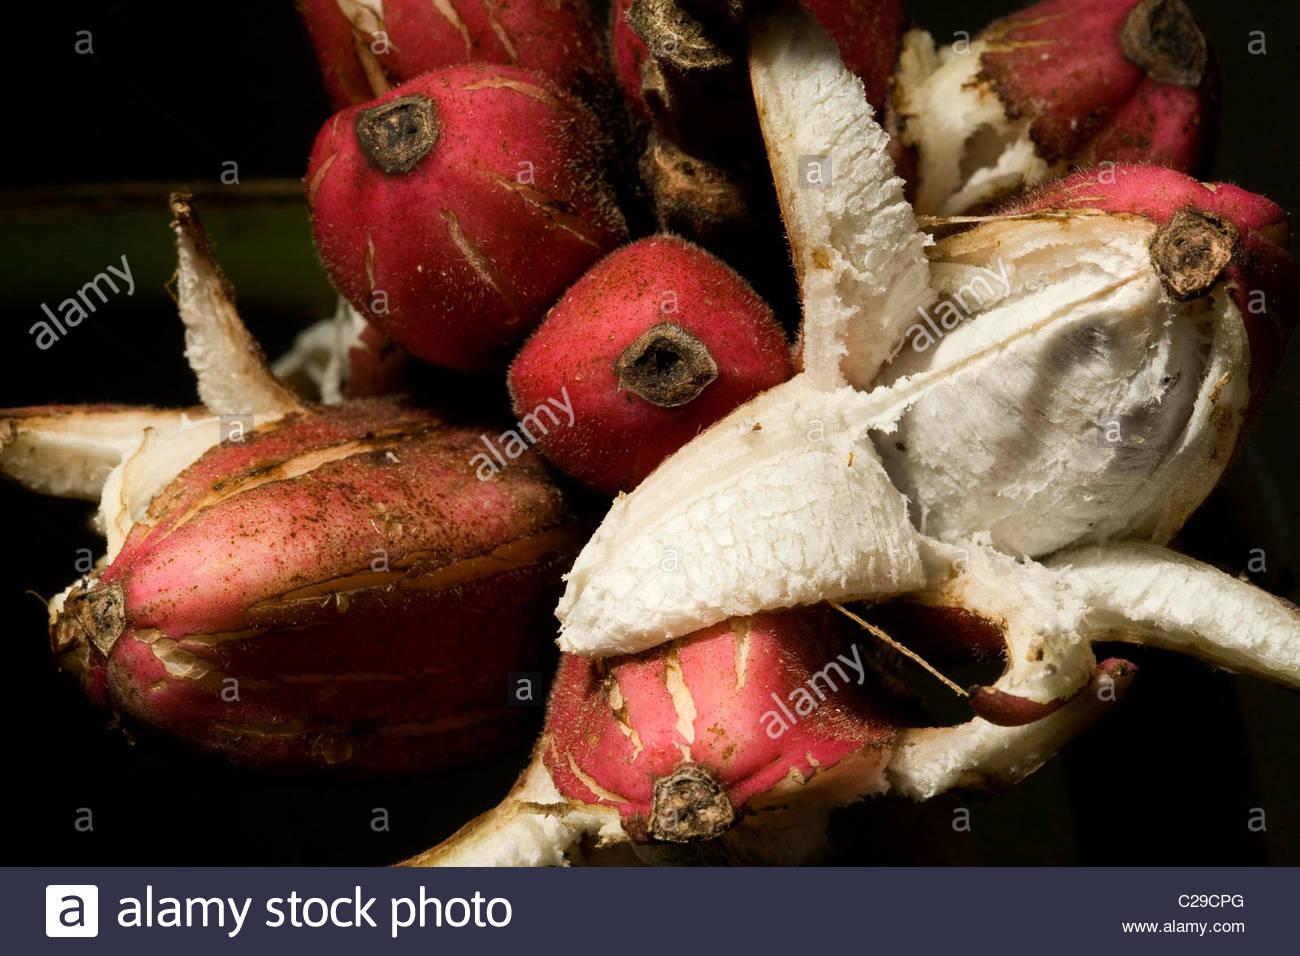 Pink banana, Musa velutina, is species of seeded banana. - Stock Image